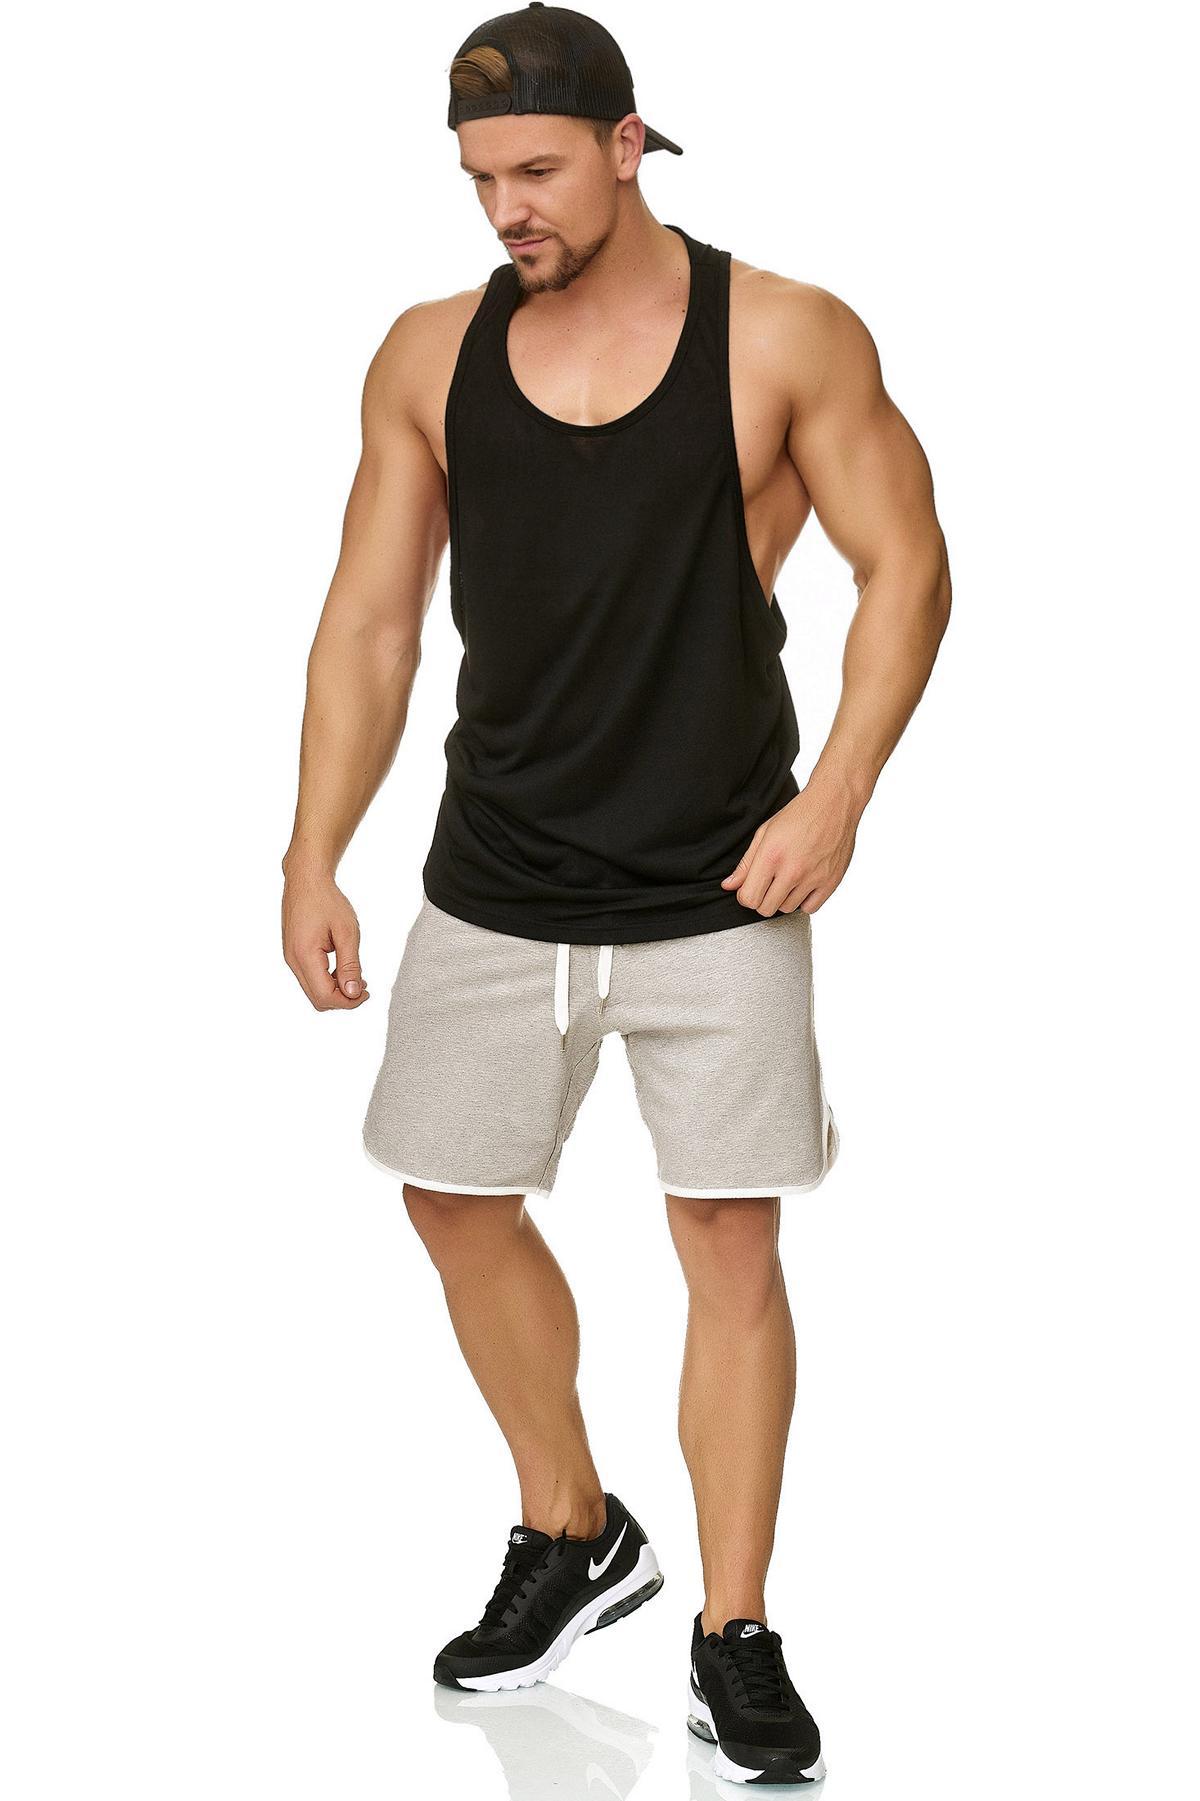 new product 86e97 8faaa Muscle Shirt Herren Tank Top Schwarz